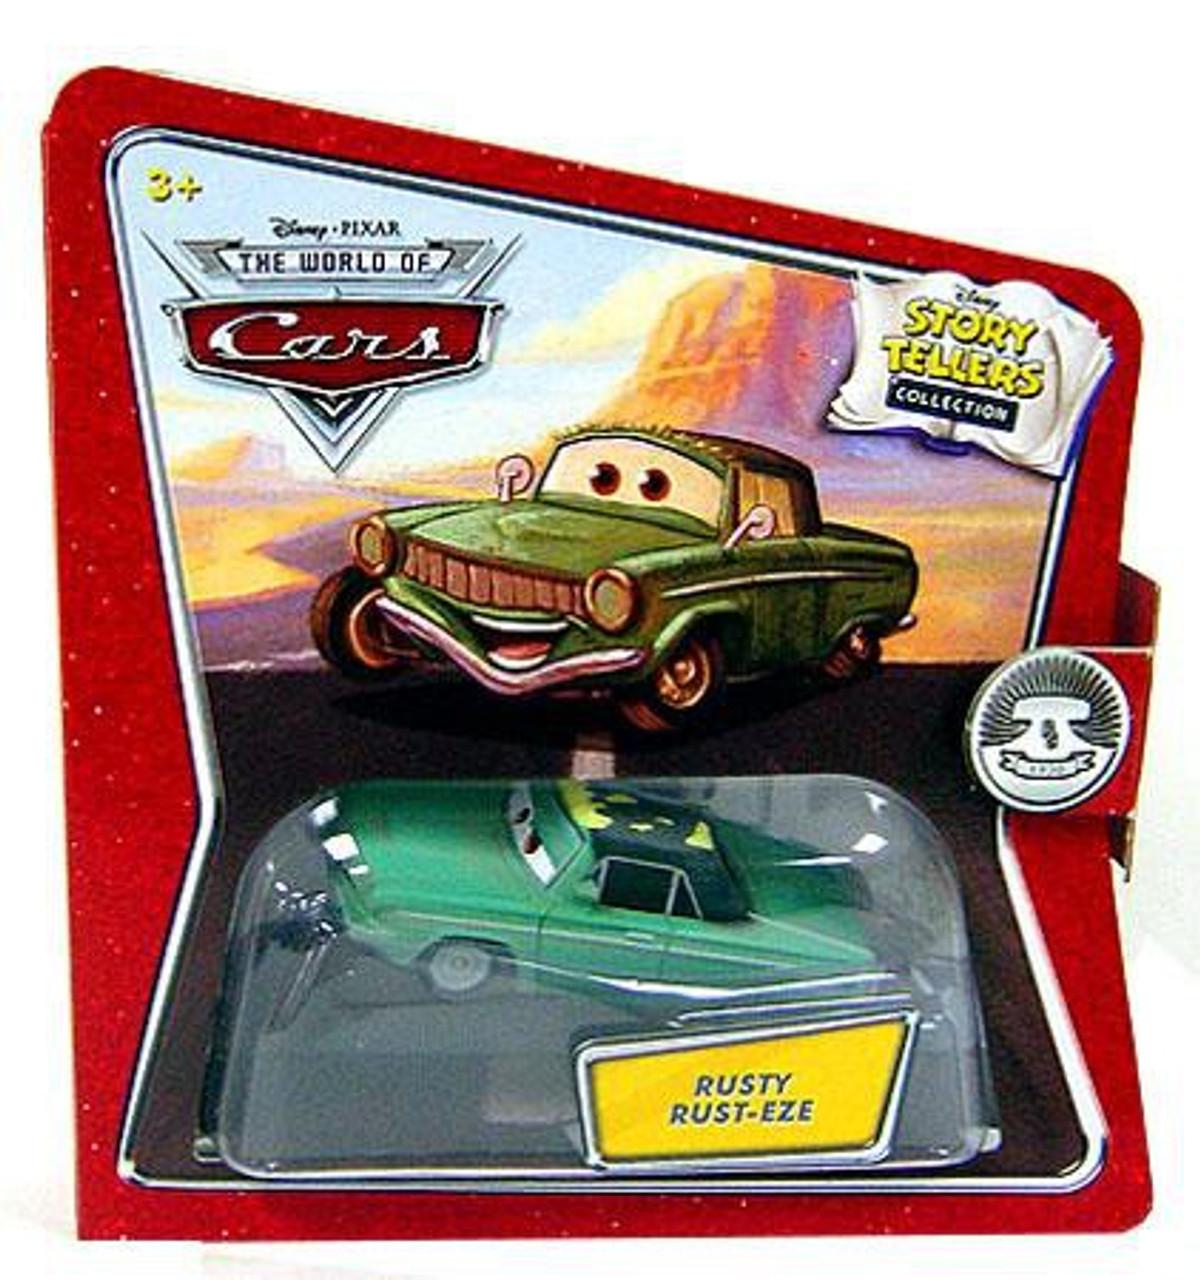 Disney//Pixar Cars 3 Rusty Rust-Eze and Dusty Rust-Eze Die-Cast Vehicles